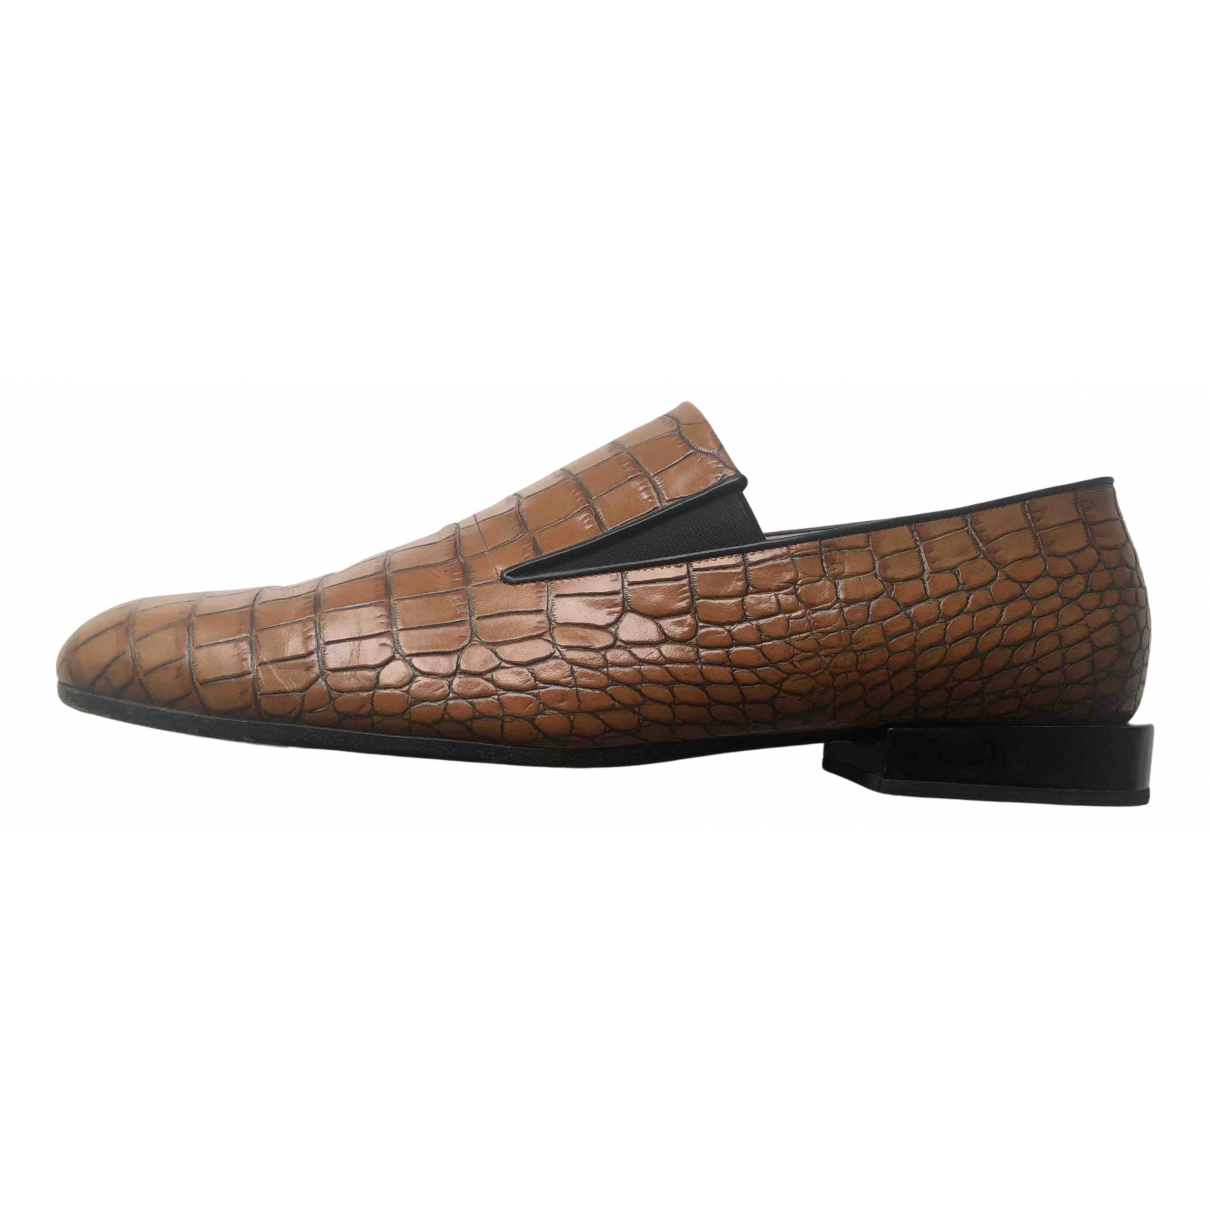 Dries Van Noten N Camel Leather Flats for Women 42 EU